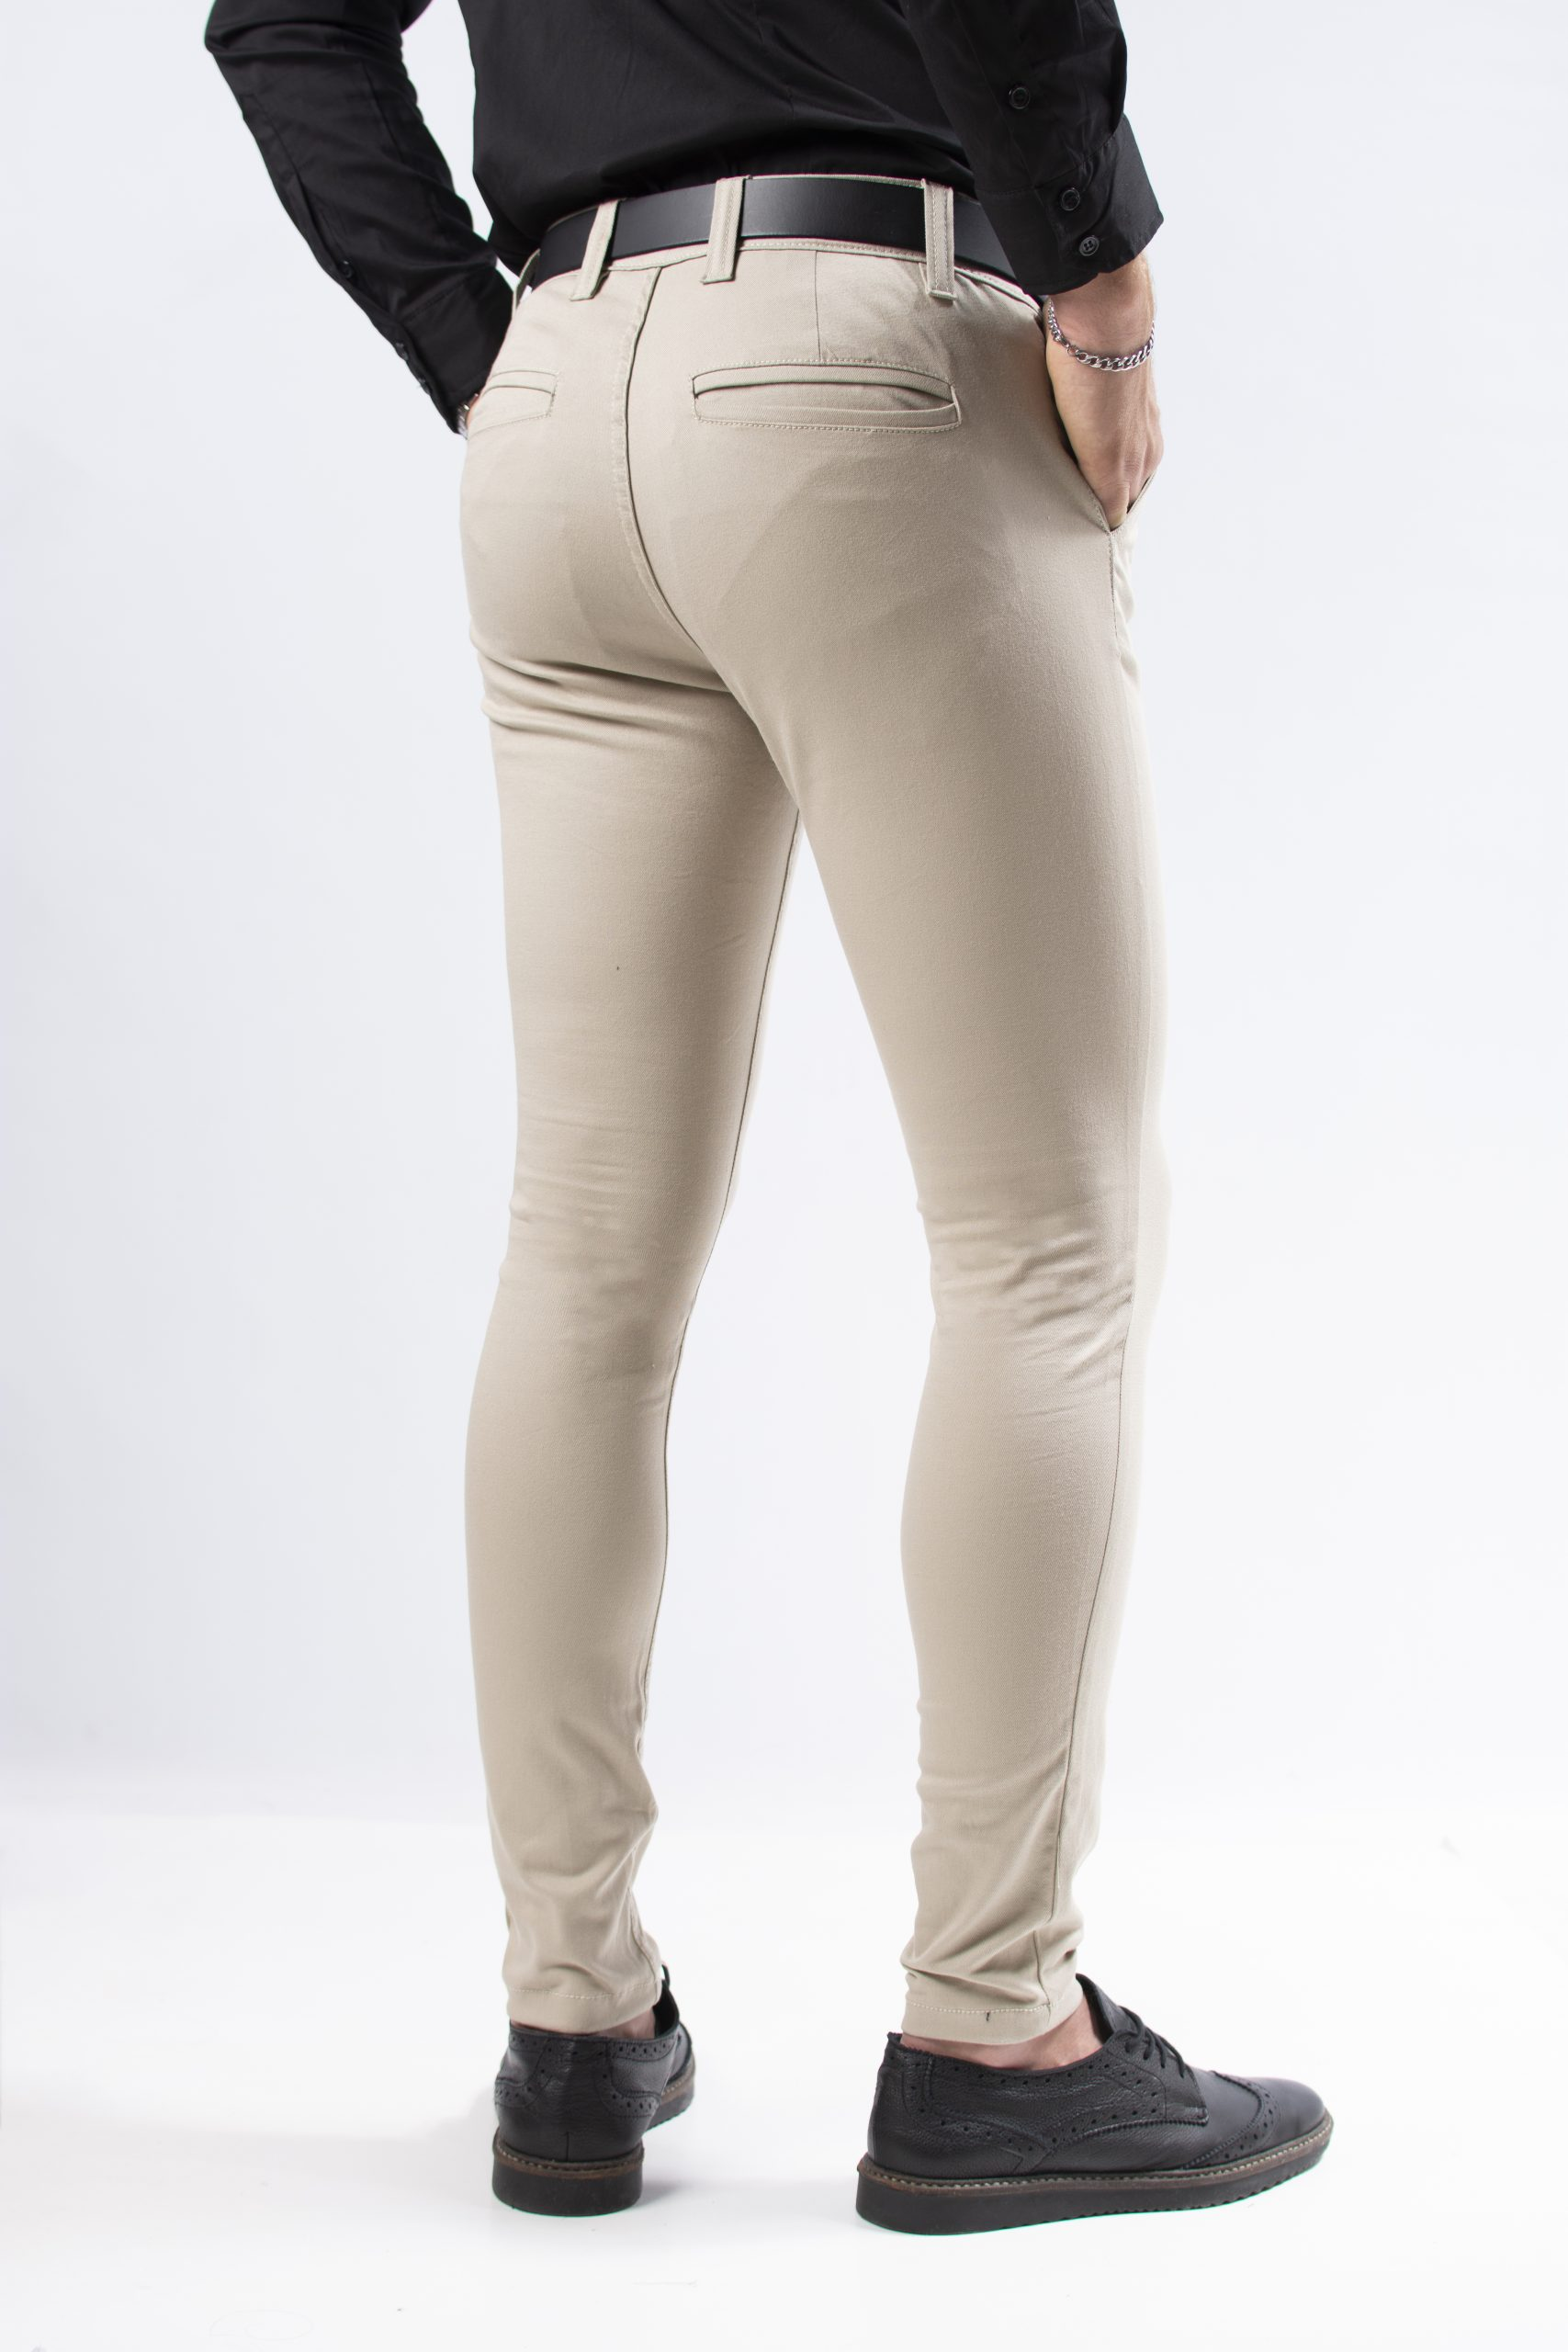 Pantalon Corte Chino Beige Jc Moda Tienda Online